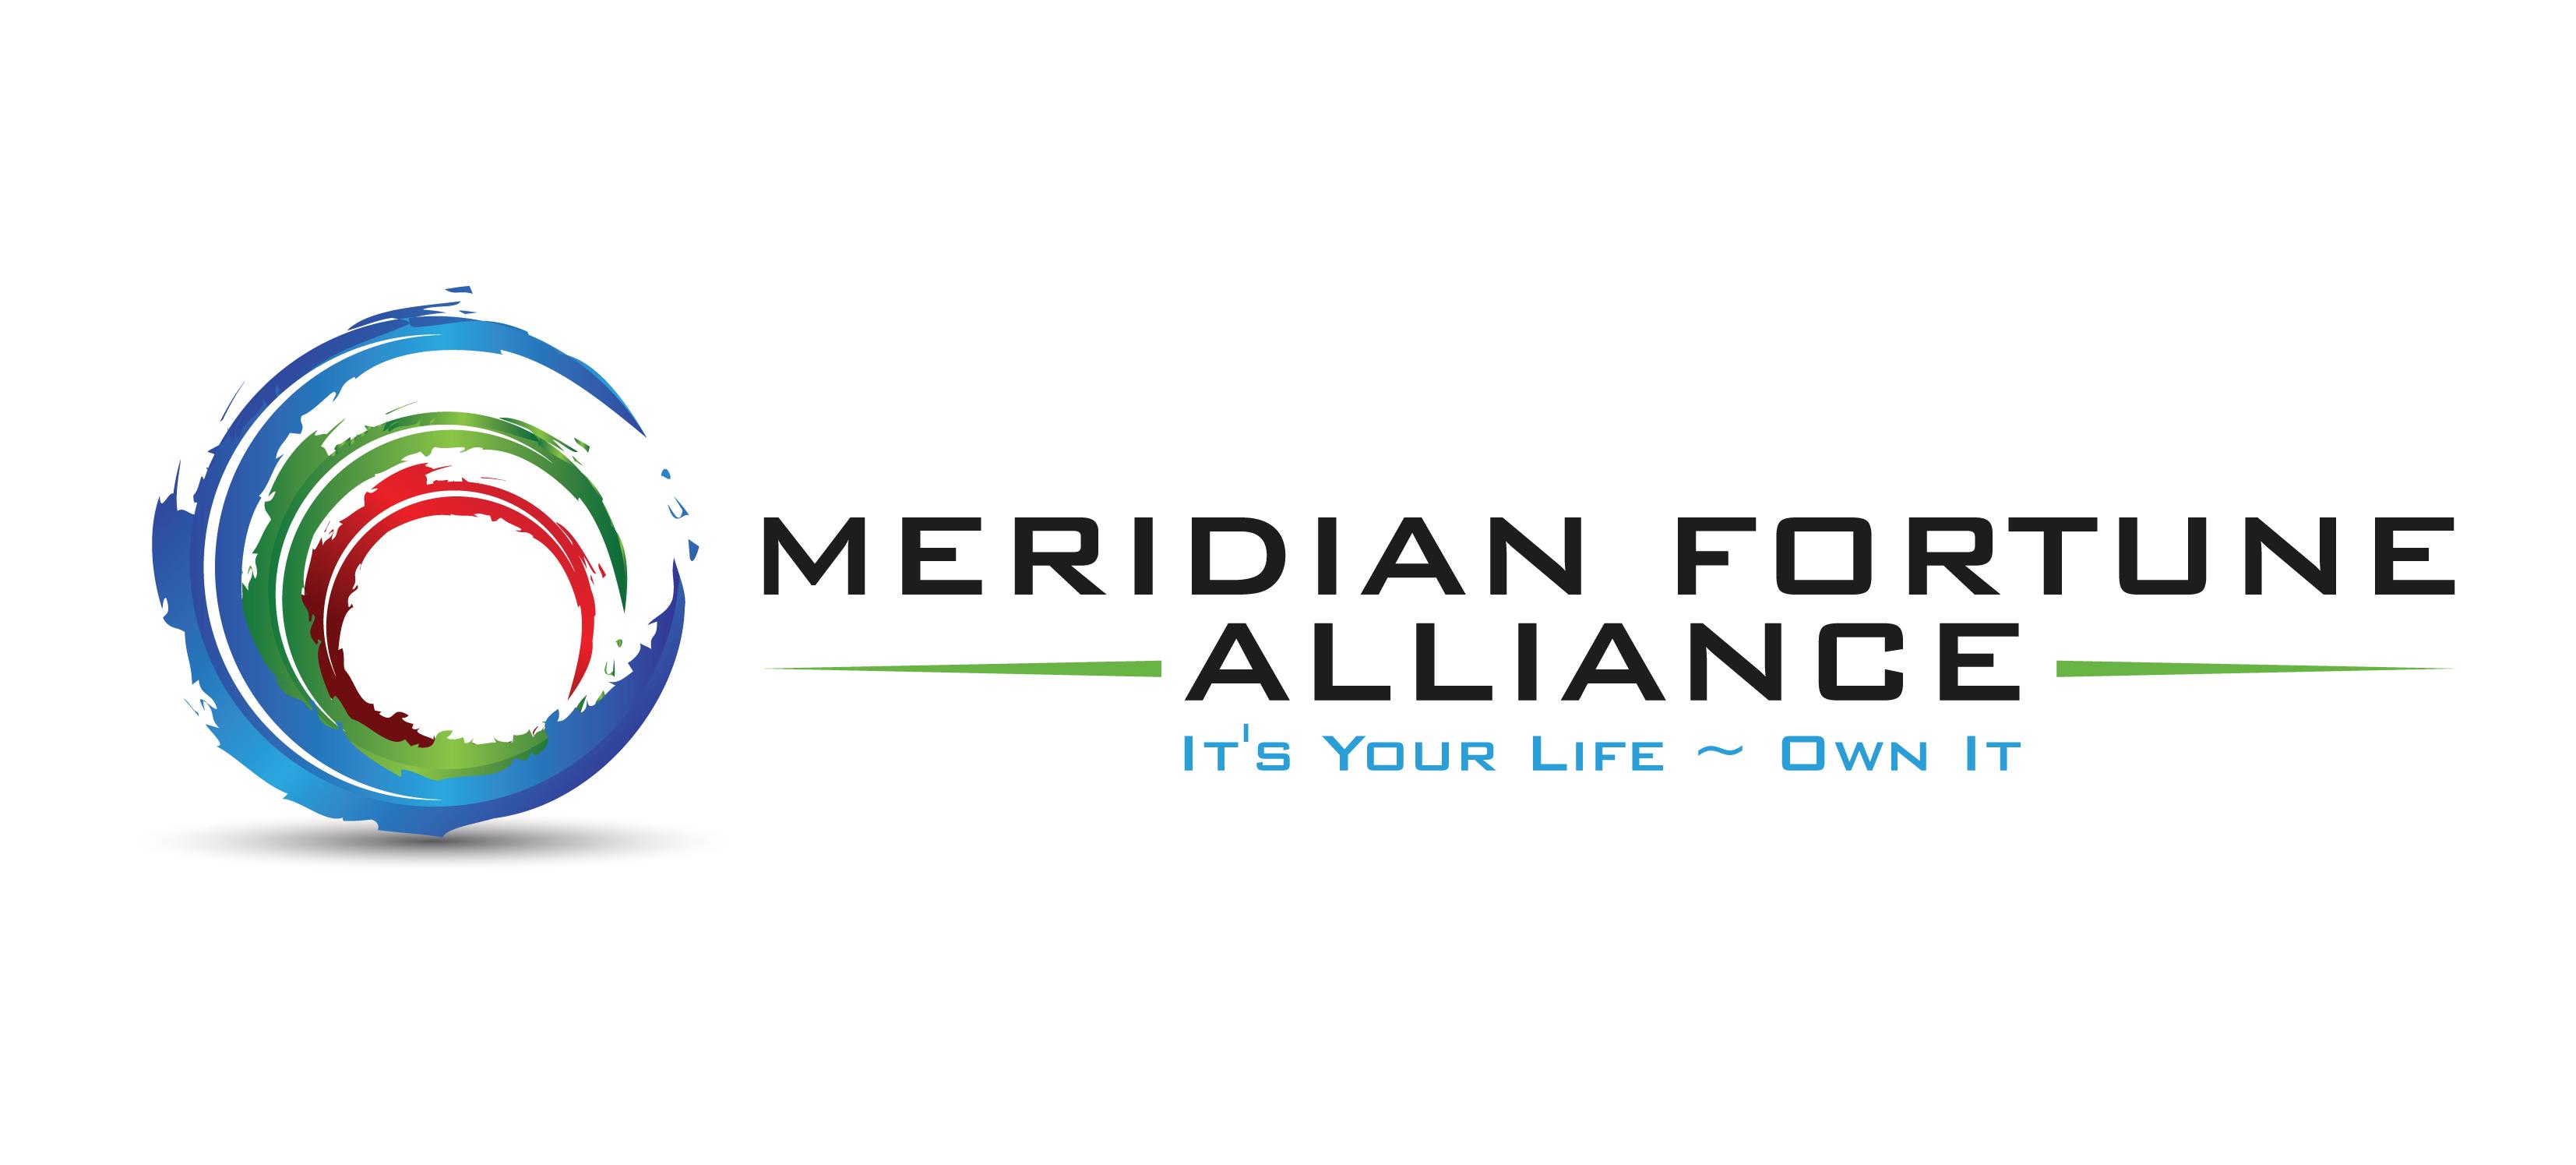 Meridian Fortune